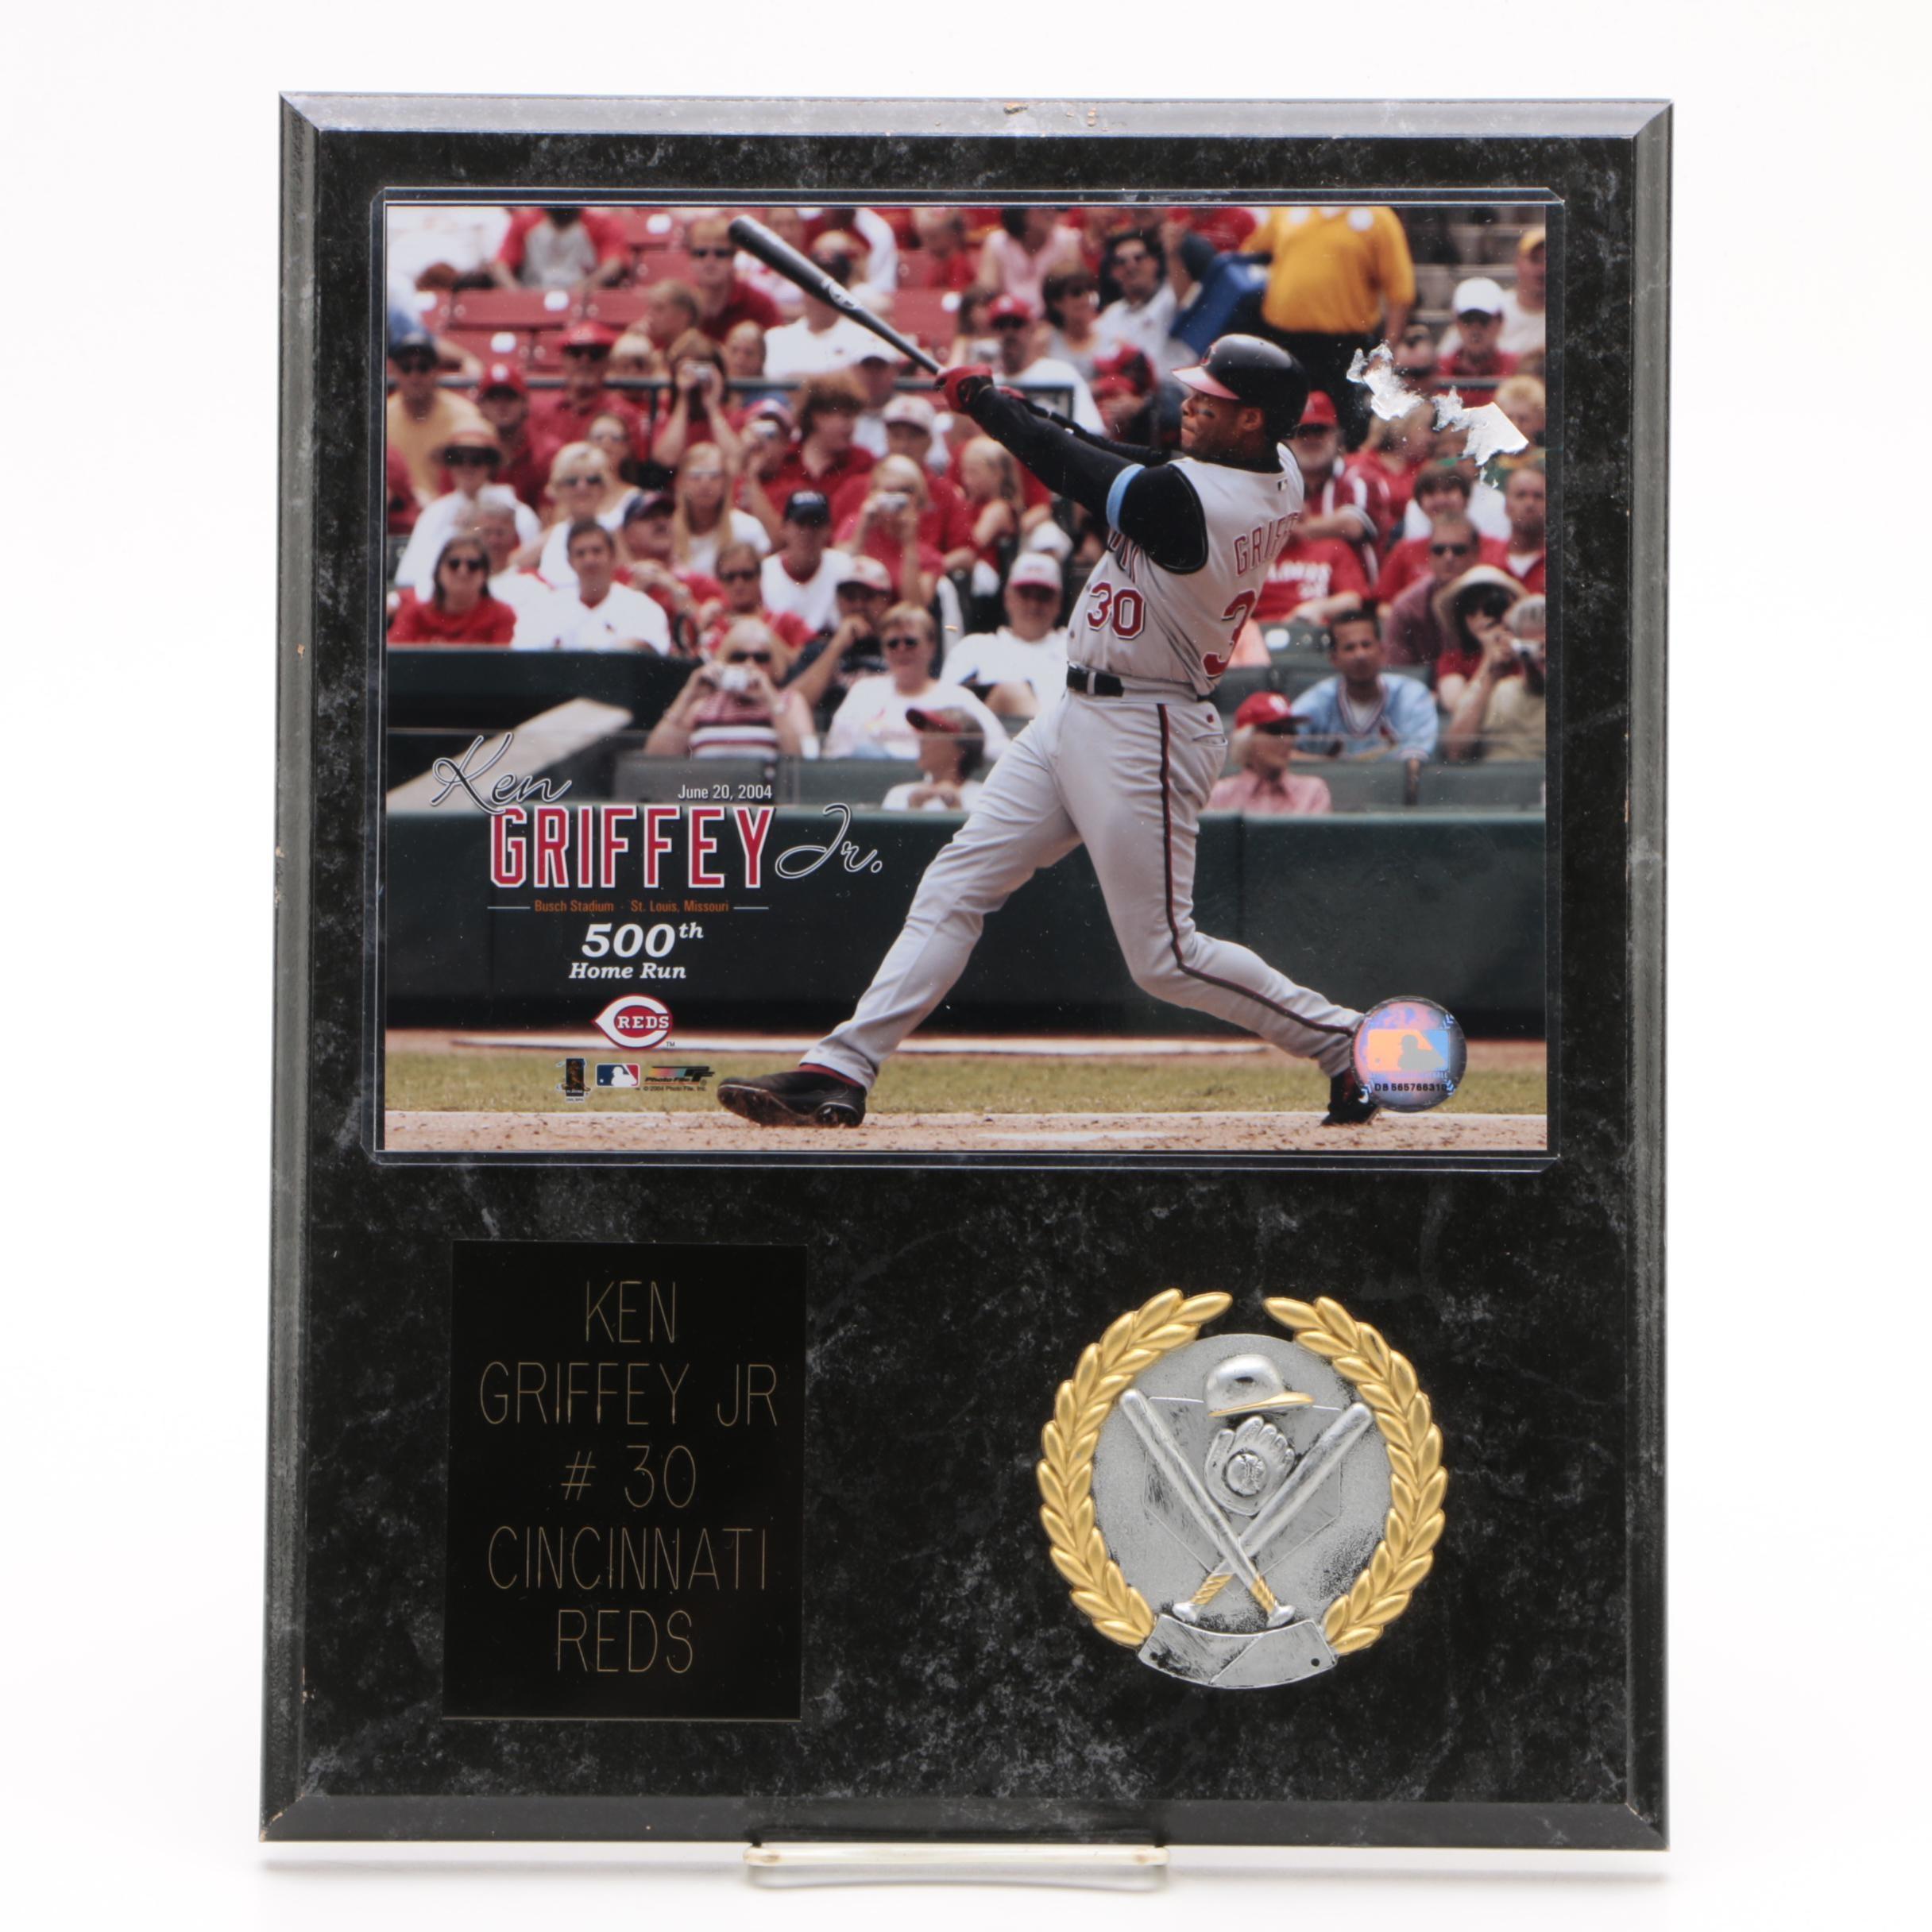 "Ken Griffey Jr. Cincinnati Reds ""500th Home Run"" Commemorative Plaque"